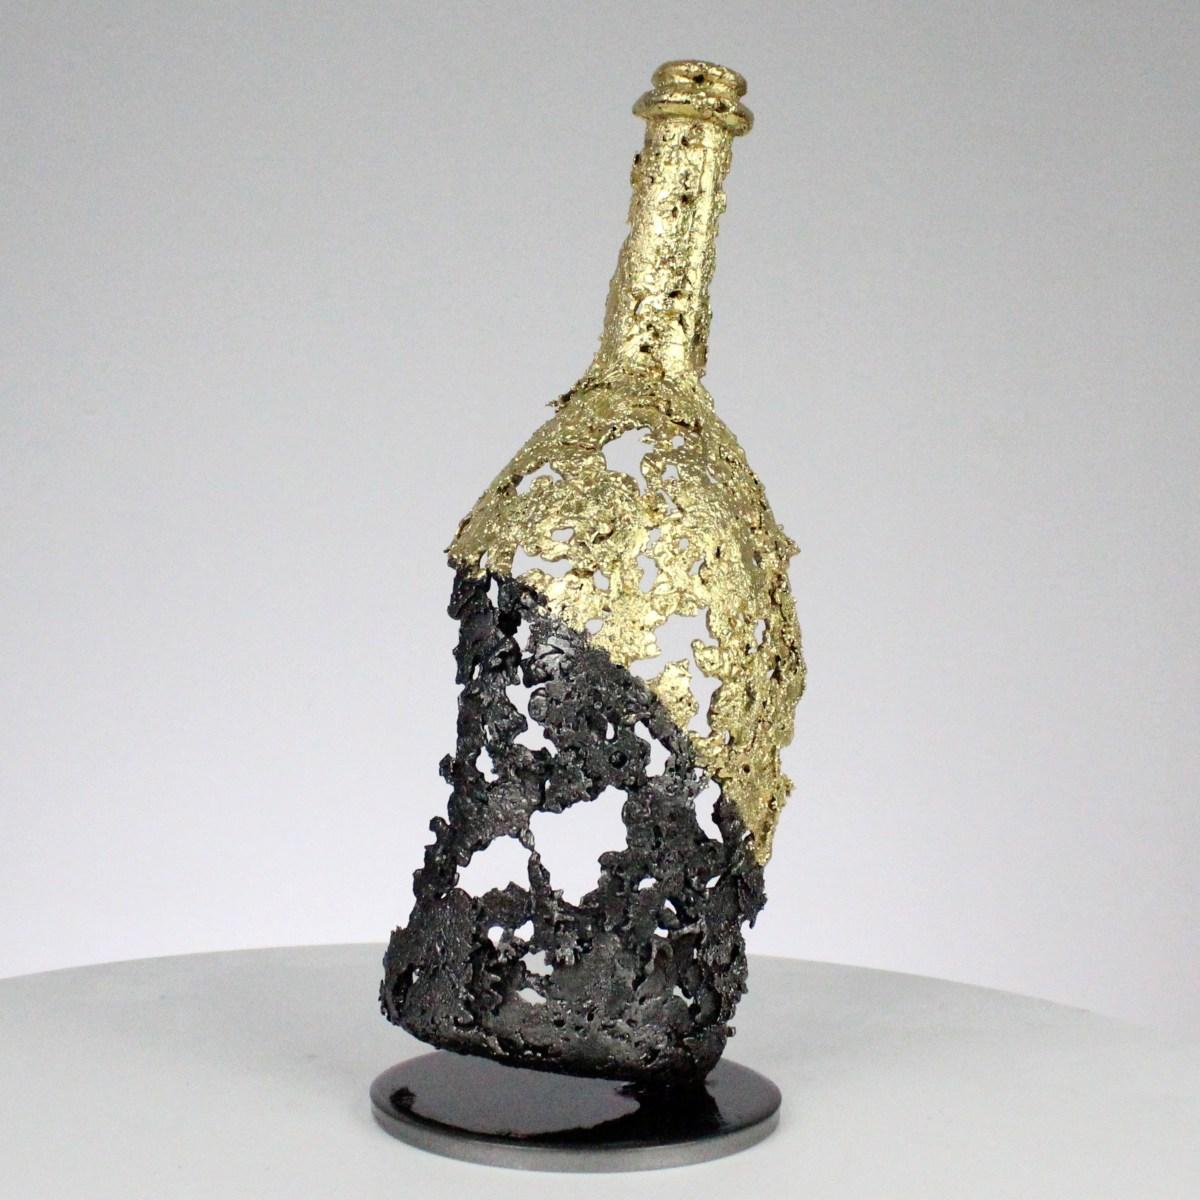 Ruinart香槟酒瓶雕塑,钢制和金色蕾丝-高29厘米